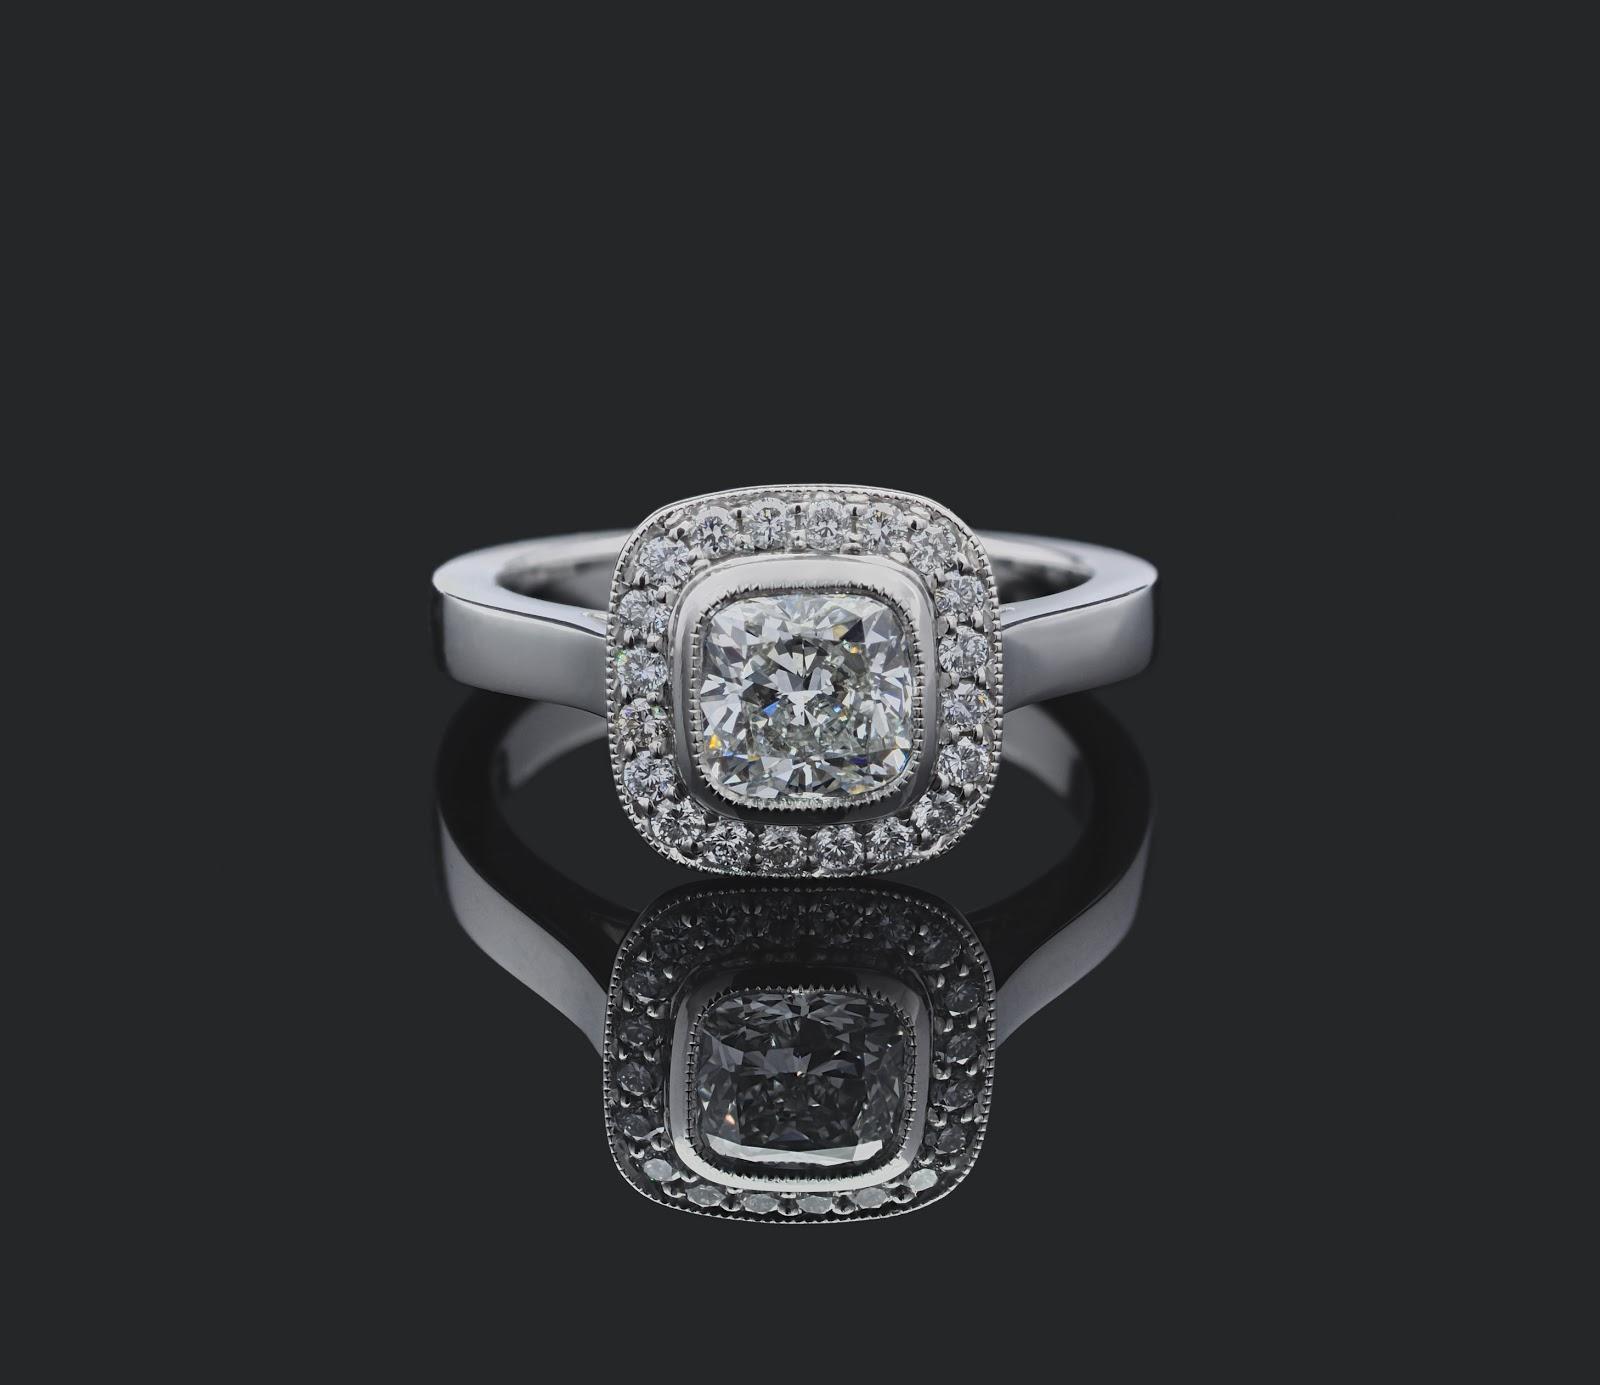 6c21f543aebb Tiffany Legacy Style Engagement Ring by Daniel Prince of London